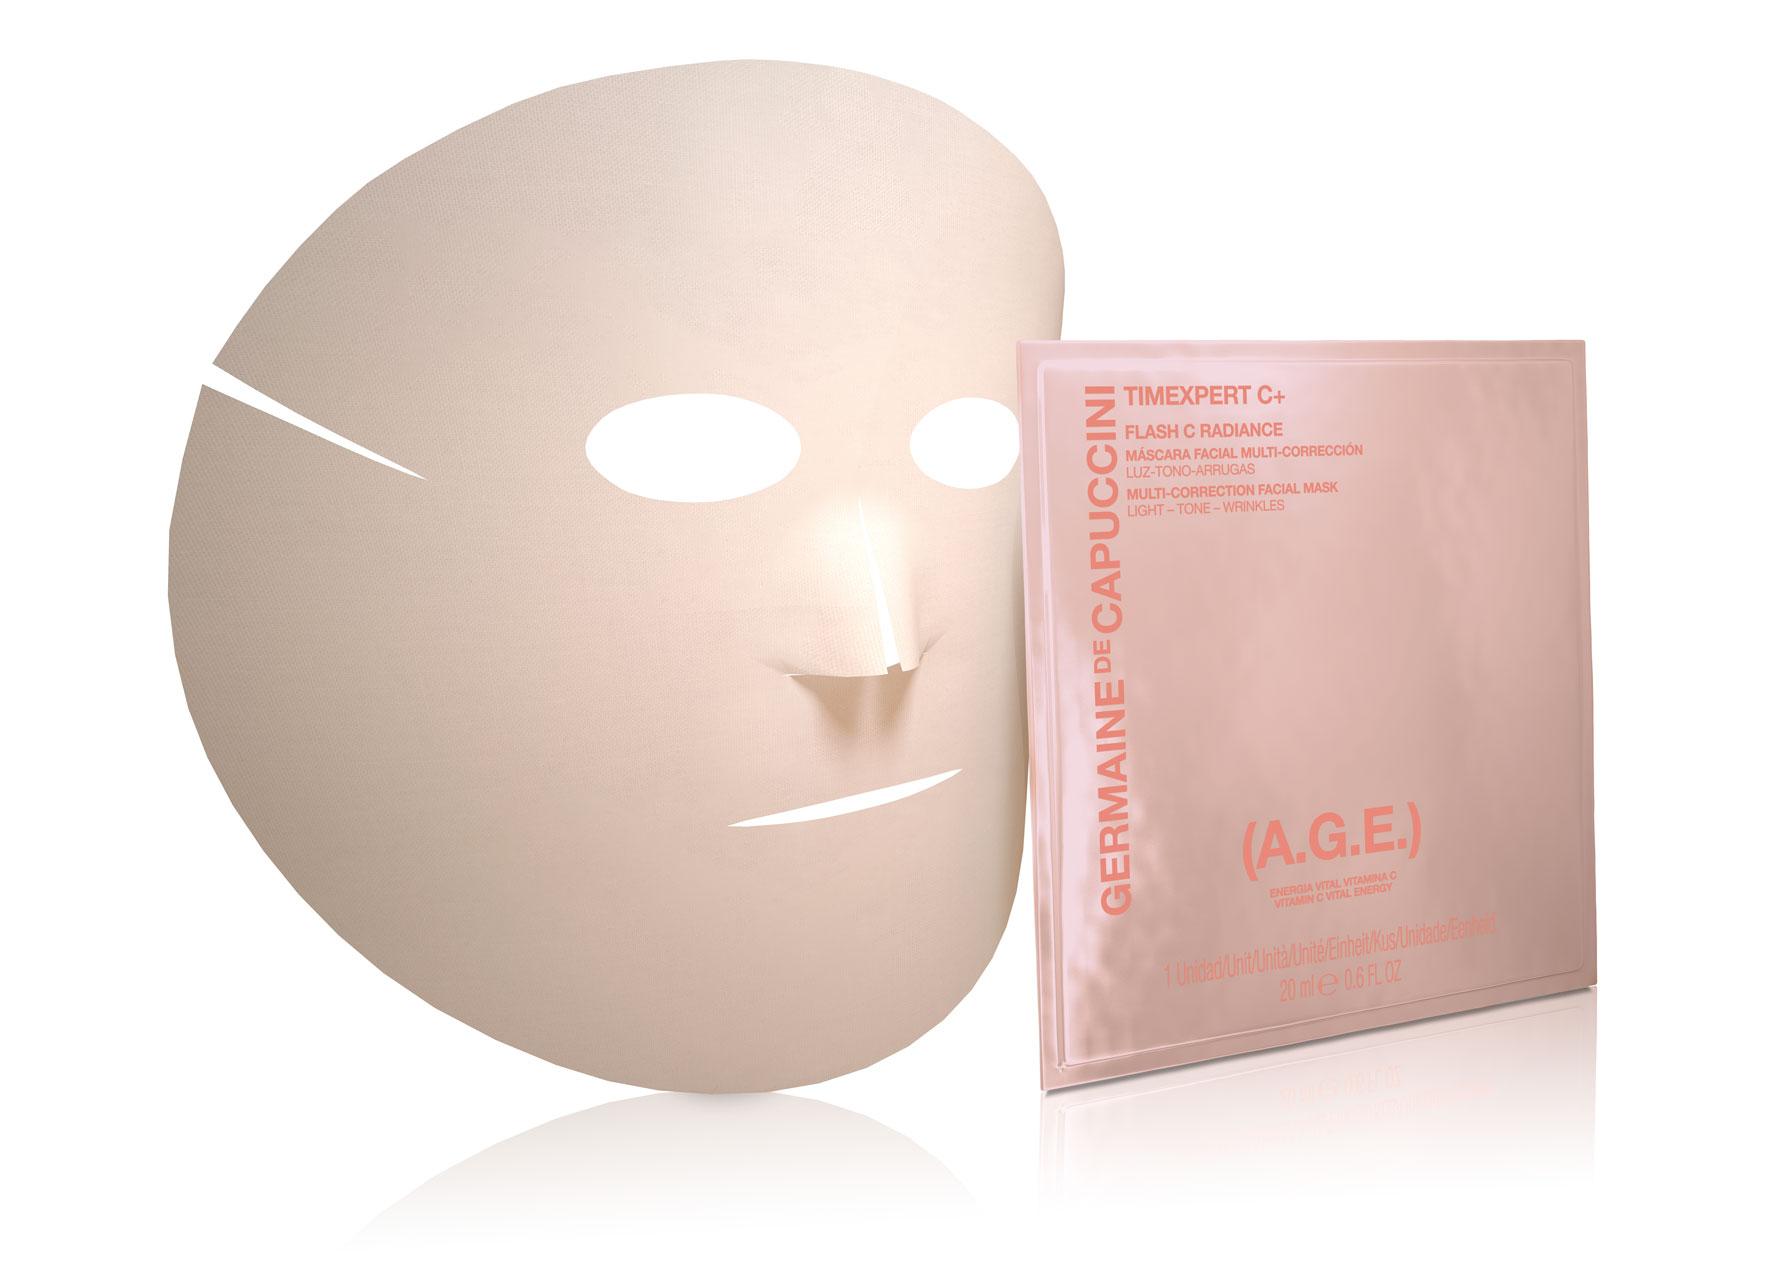 Gdc Timexpert C+ Flash C Radiance masker